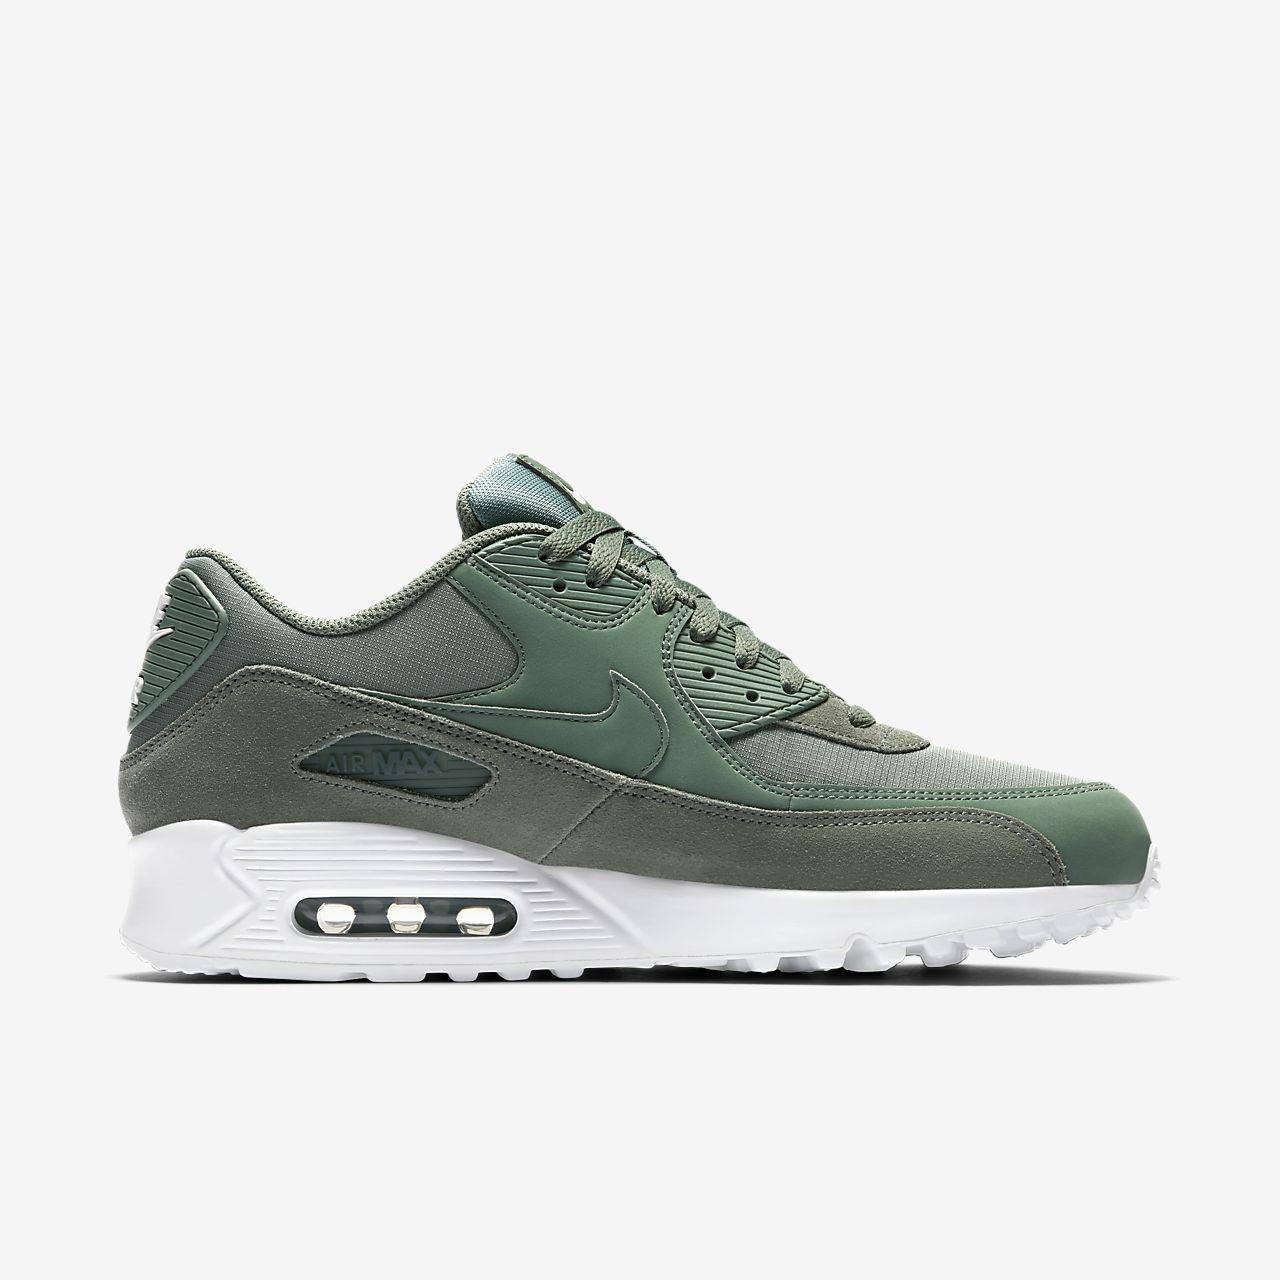 official photos f8d8a c8445 Chaussures Nike Air Max 90 Essential vertes homme Footlocker En Ligne  cIhklCZT